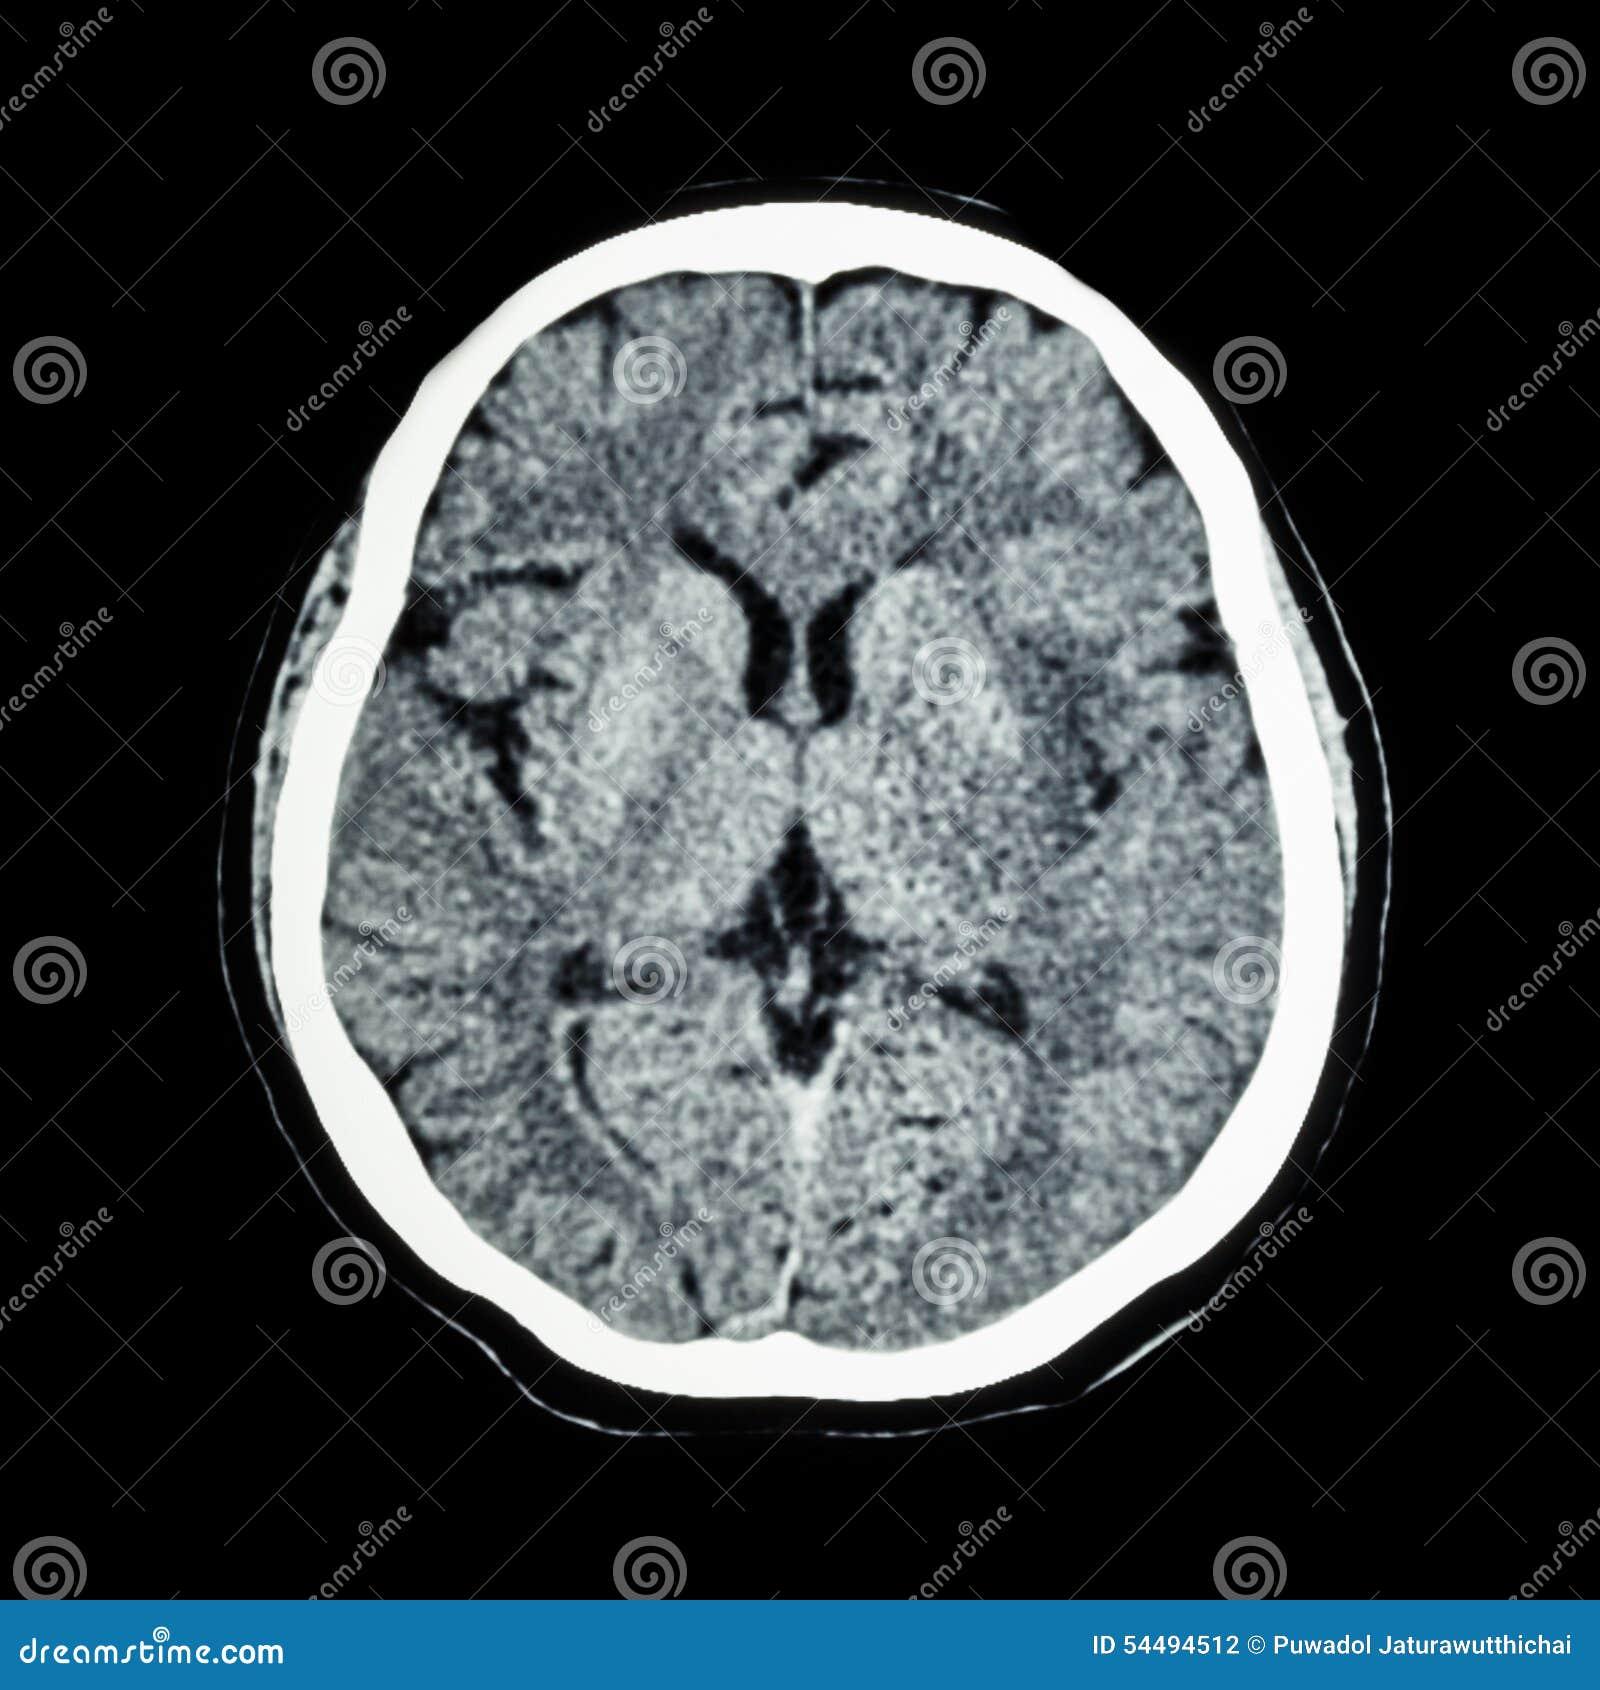 Cat Disease Human Brain